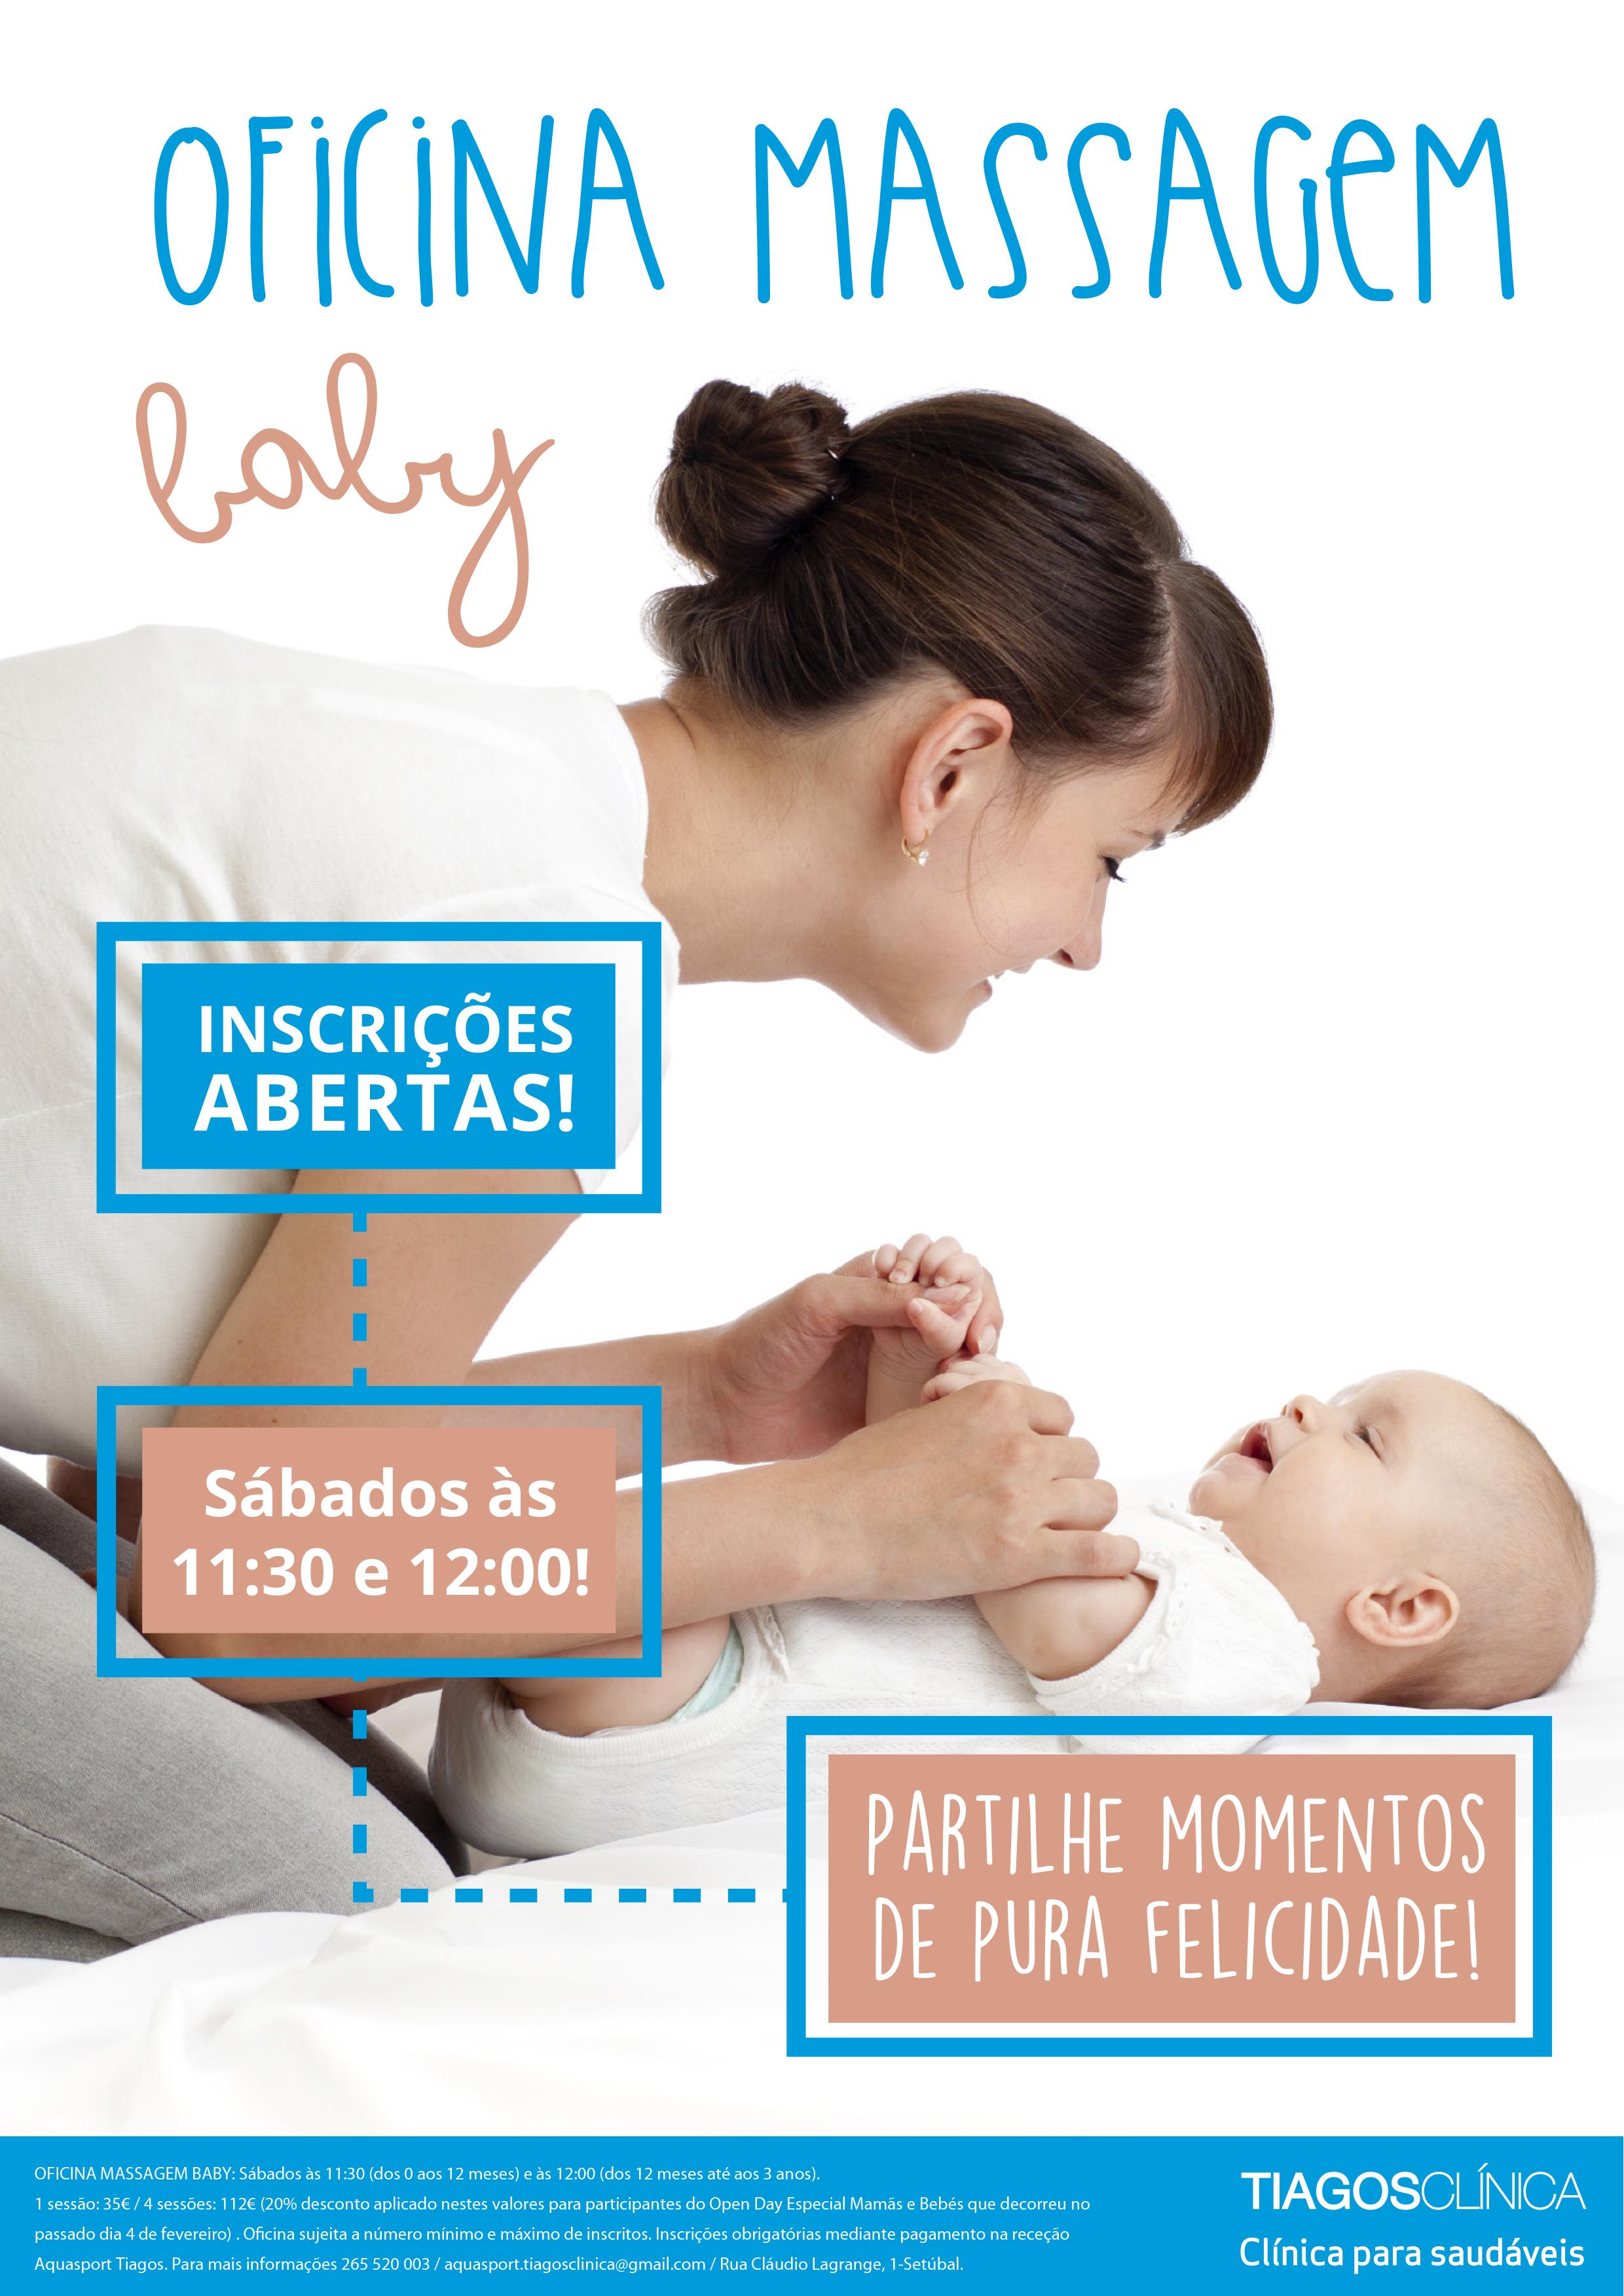 Oficina Massagem Baby